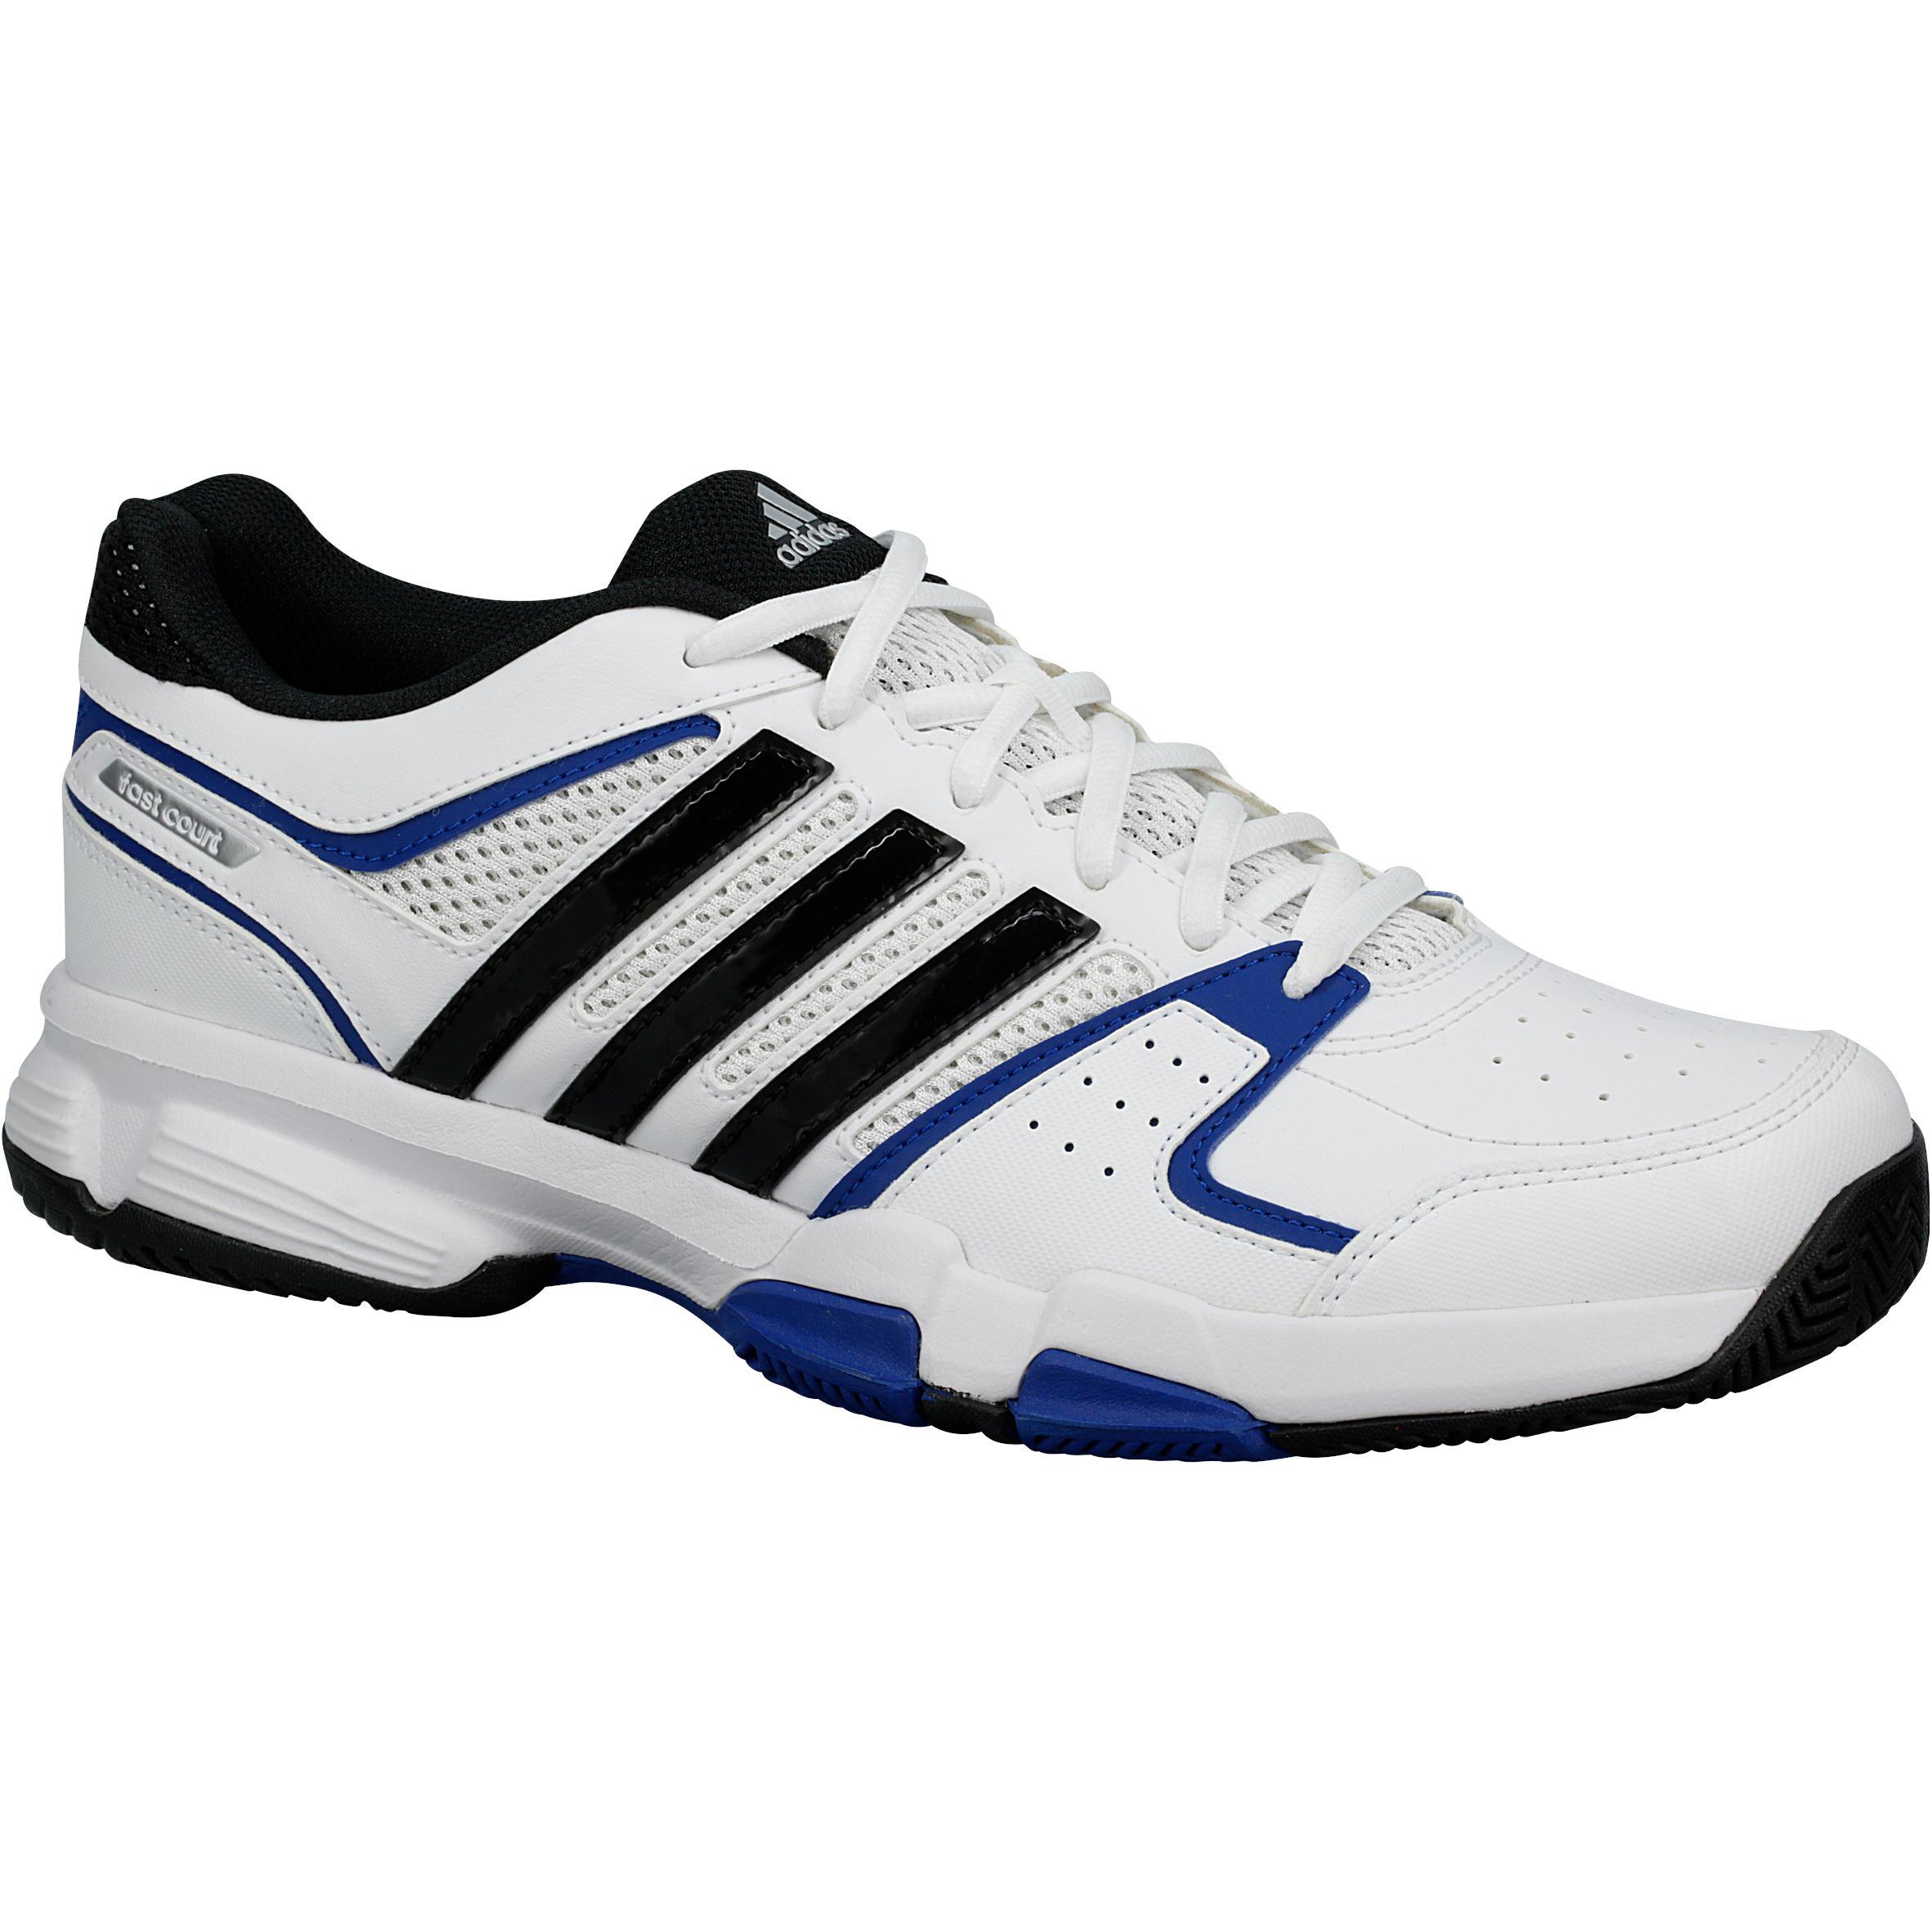 chaussures tennis adidas homme blanche